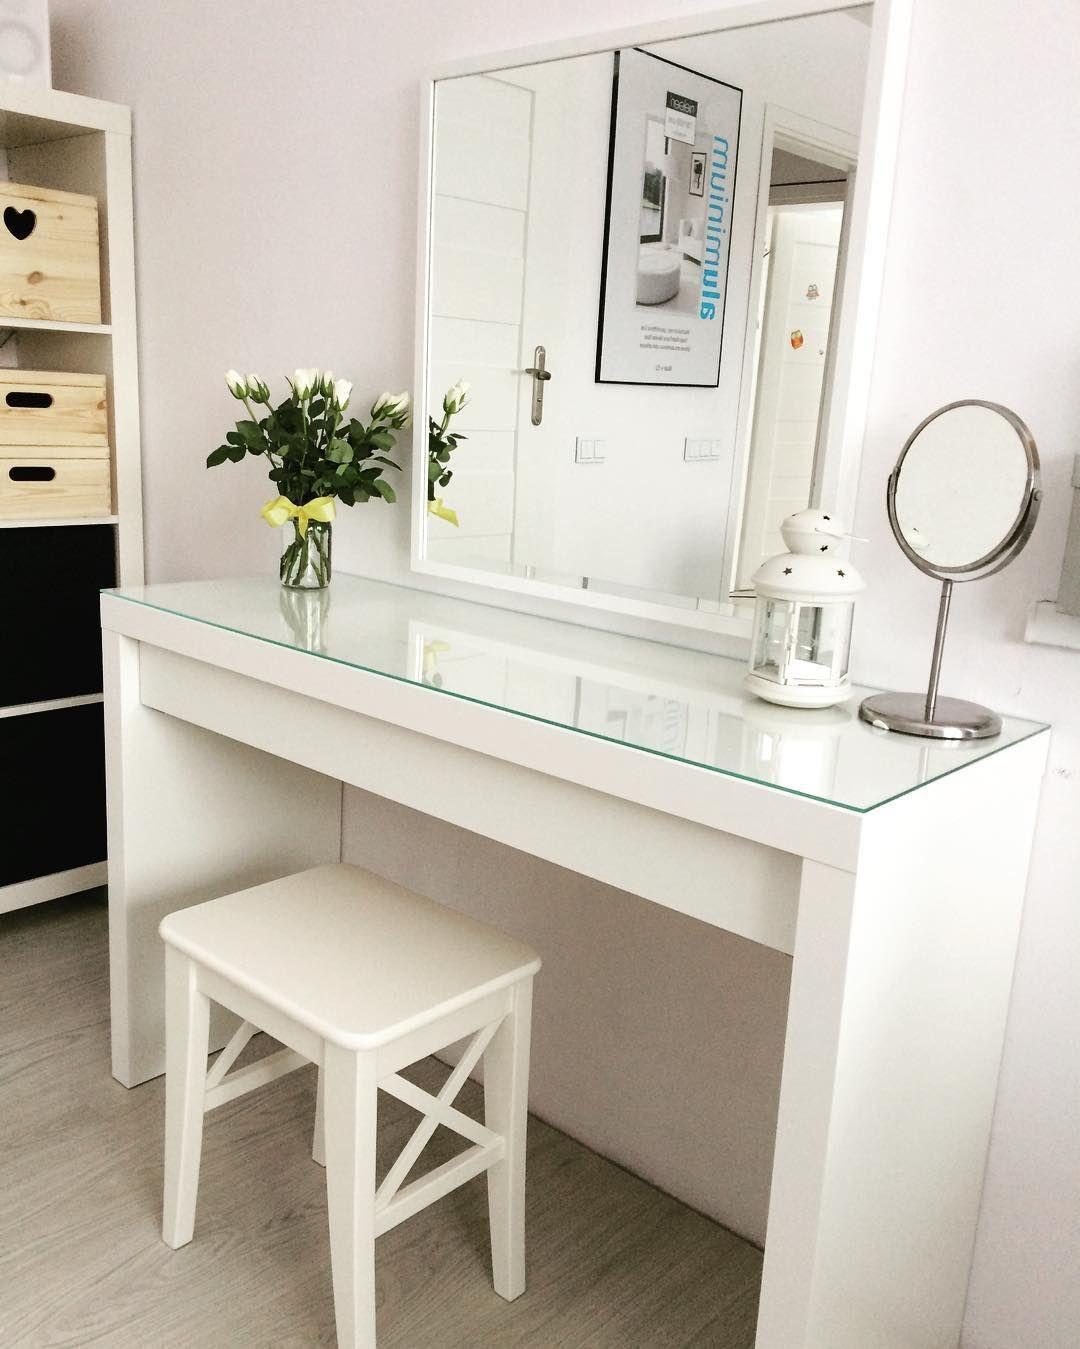 Minimal Ikea Malm Dressing Table Vanity Table Ideas Schminktisch Kommode Ikea Ankleide Schminktisch Ideen Ikea